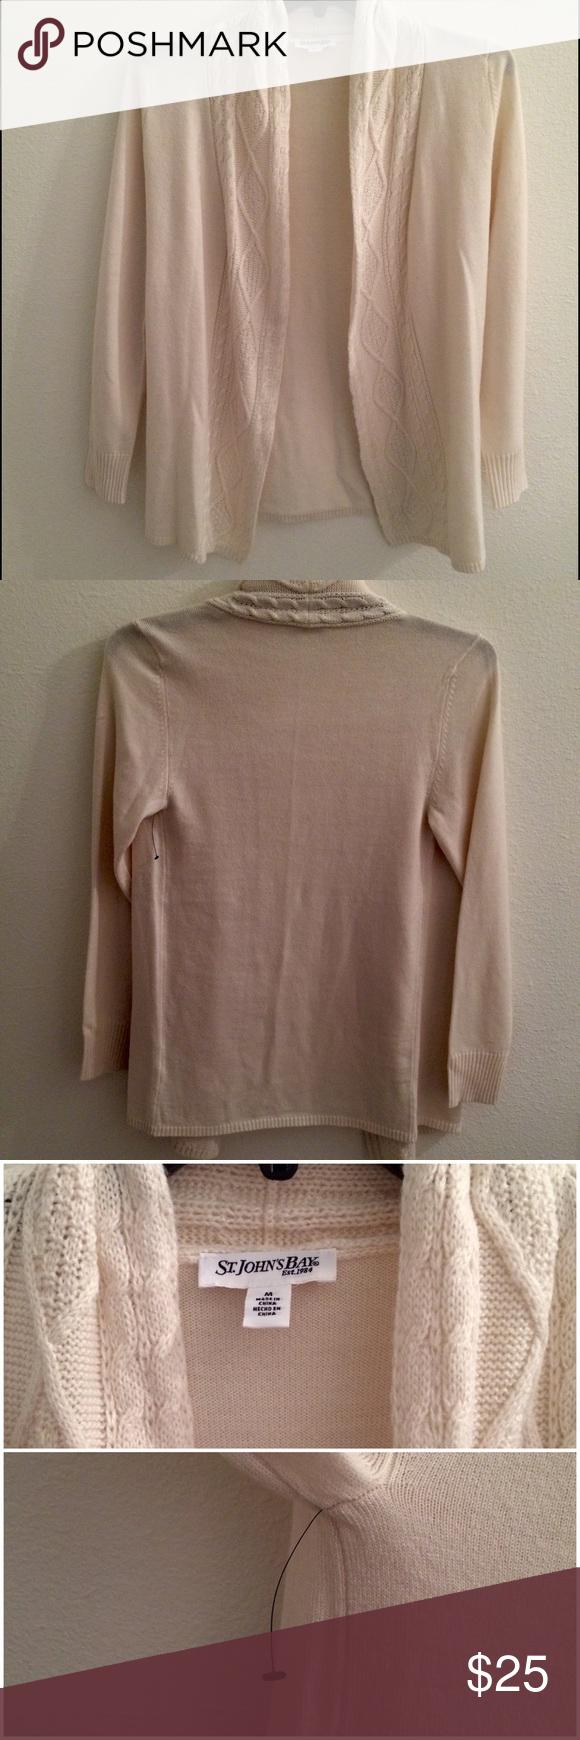 St. John's Bay cream cardigan sweater St. John's Bay cream colored ...